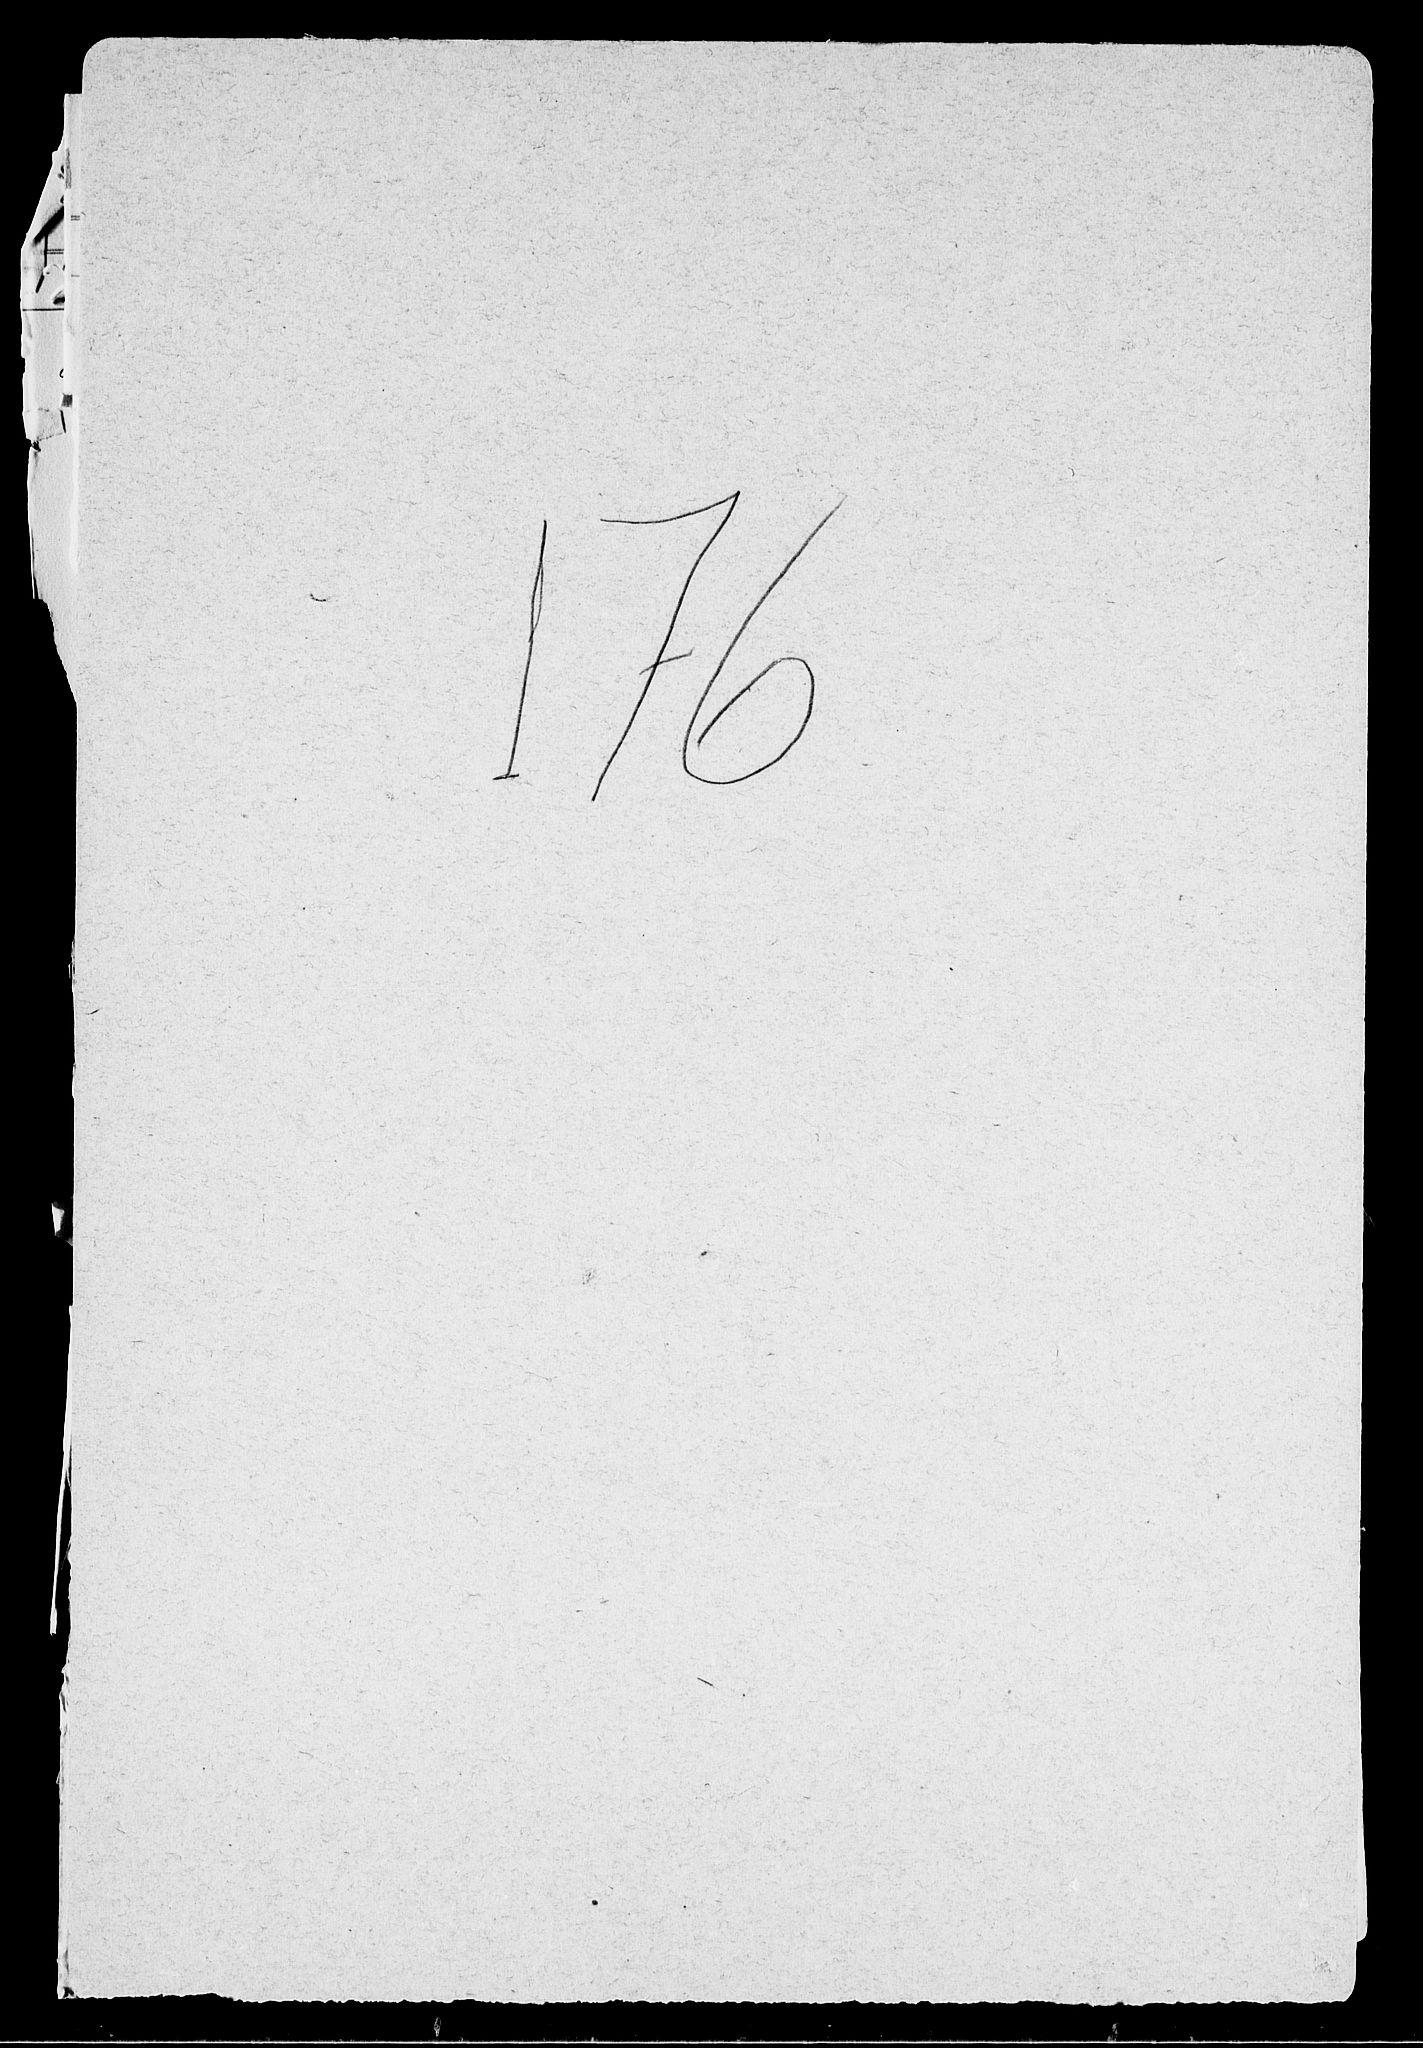 RA, Modums Blaafarveværk, G/Gd/Gda/L0176, 1843-1845, s. 2